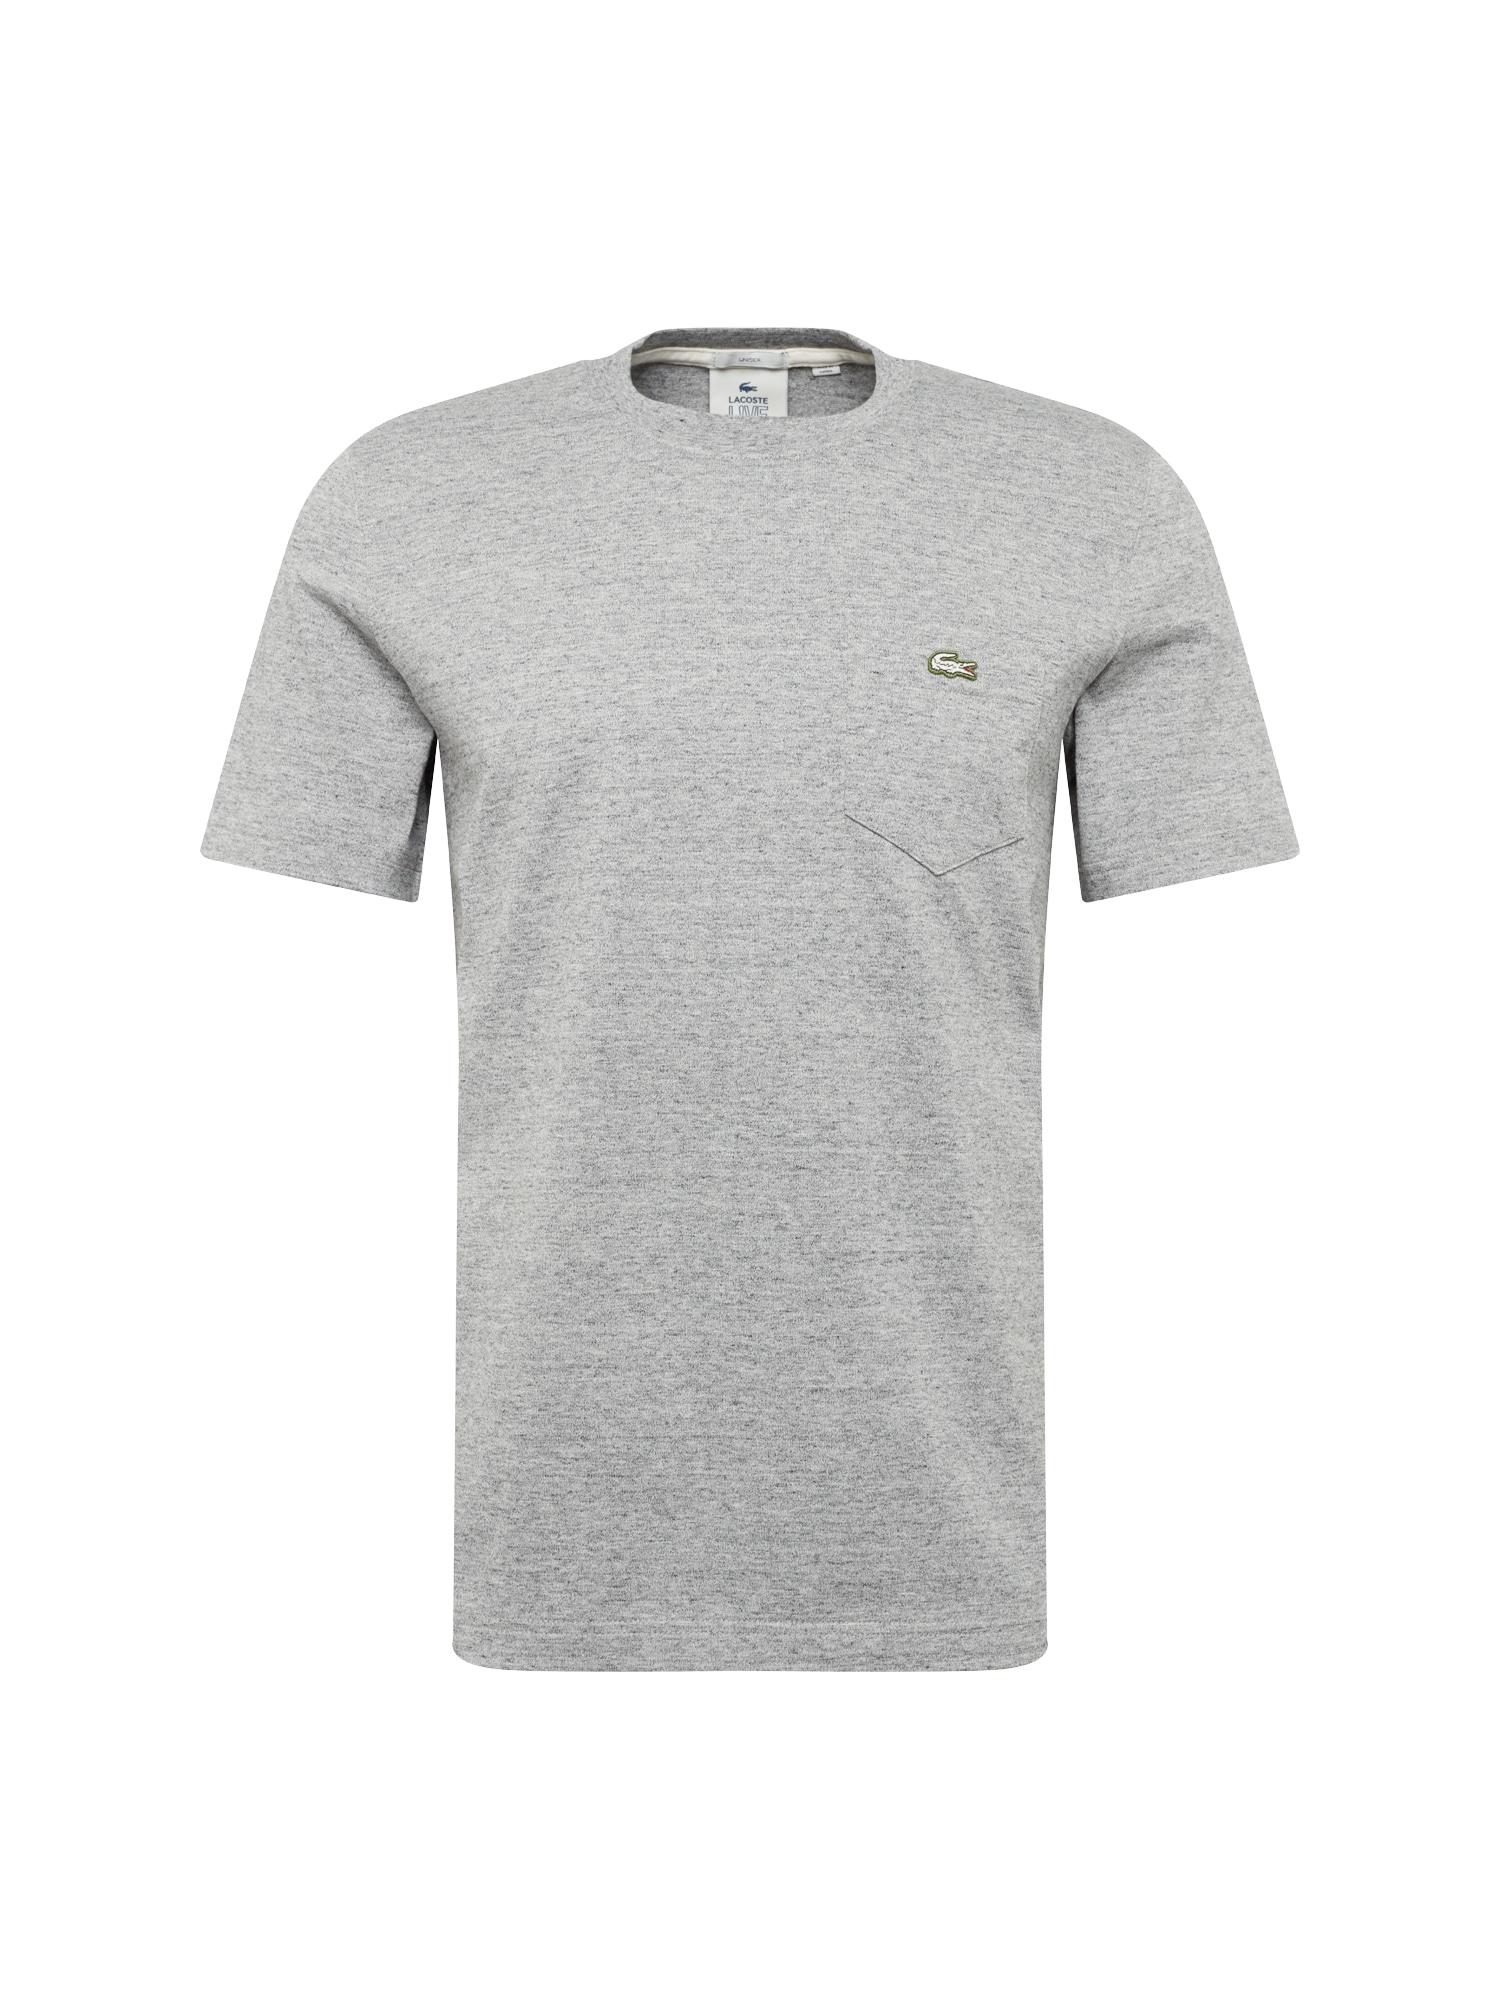 Tričko šedý melír Lacoste LIVE